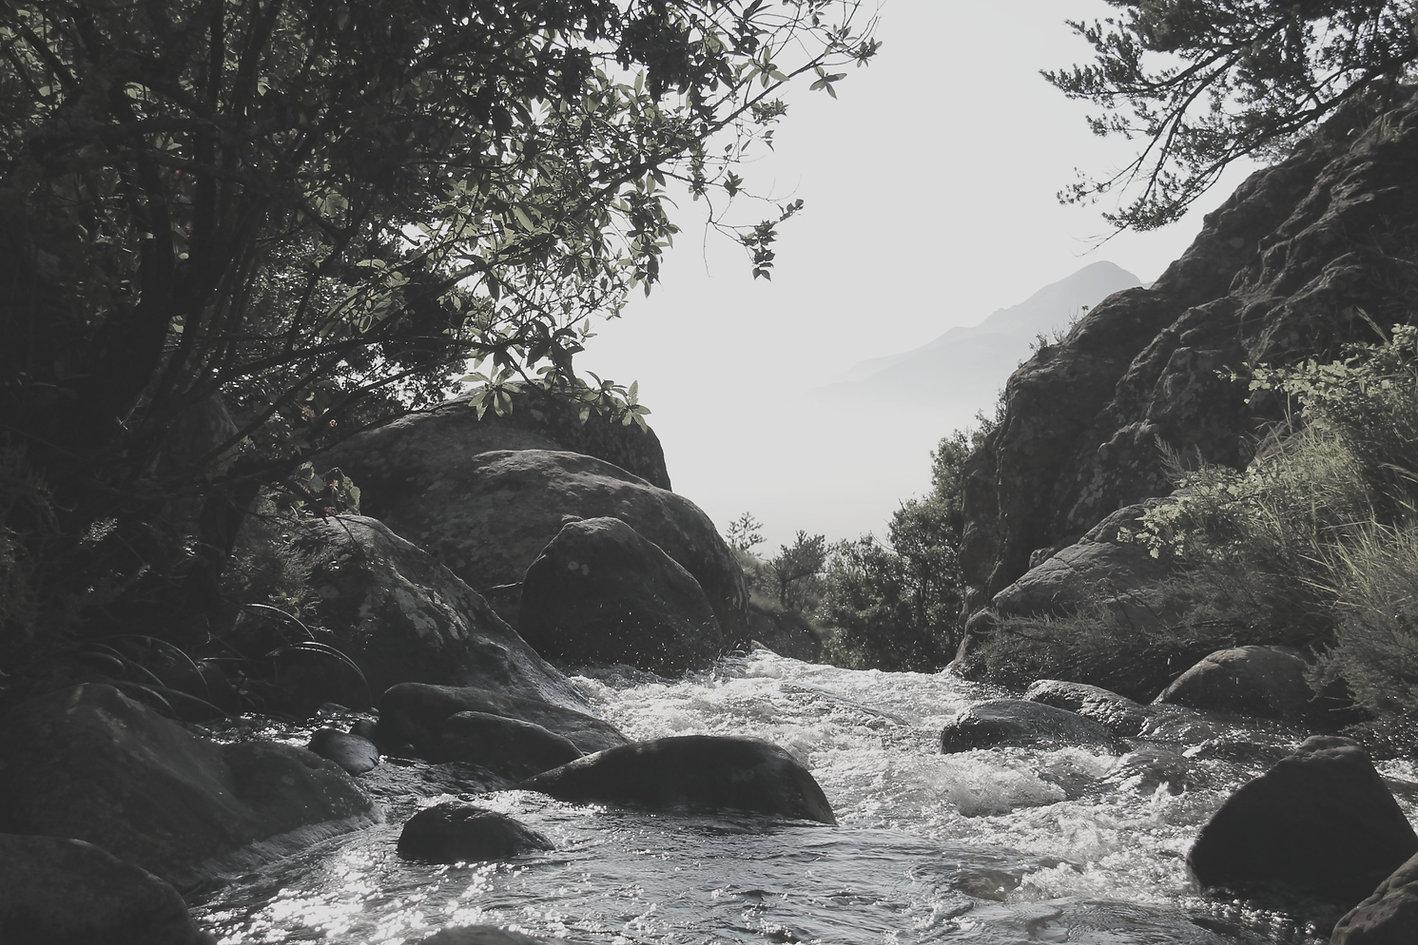 River_edited.jpg